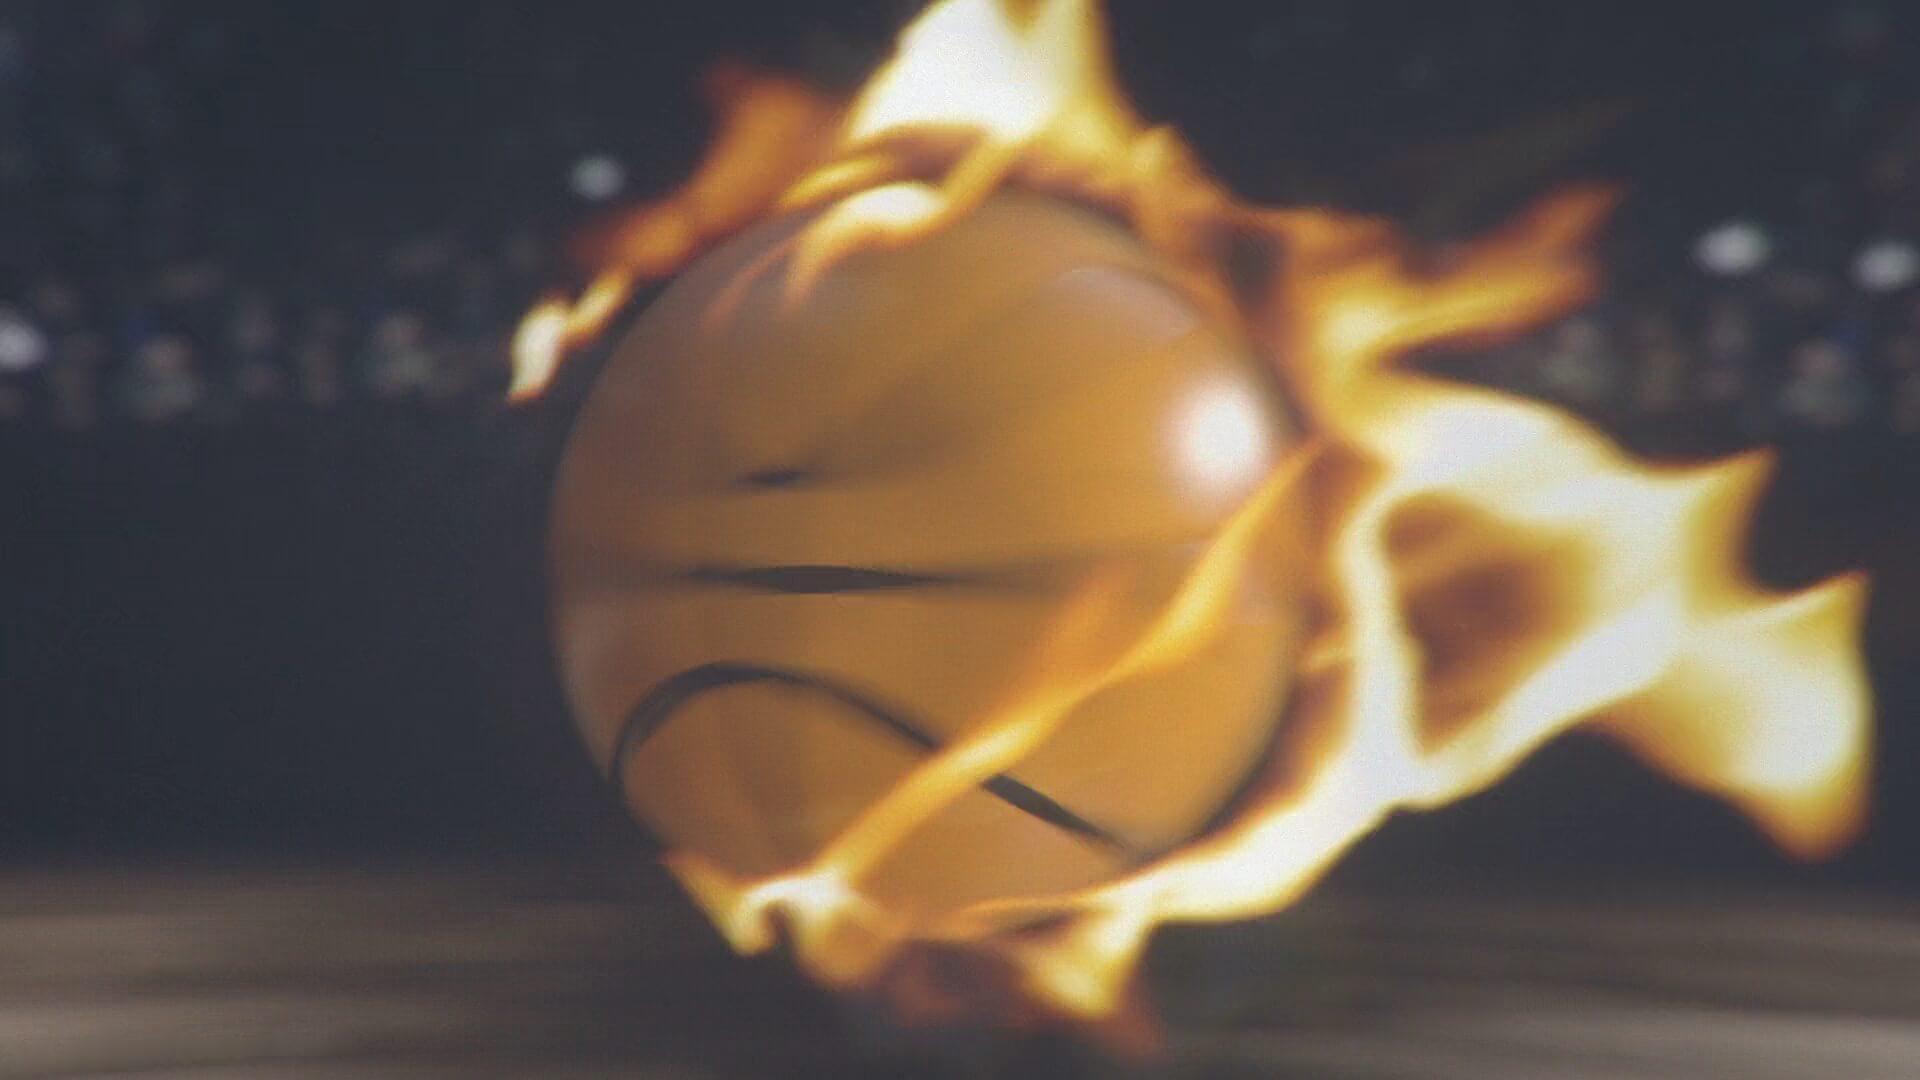 adinqs reklamfilm som sponsor åt borås basket